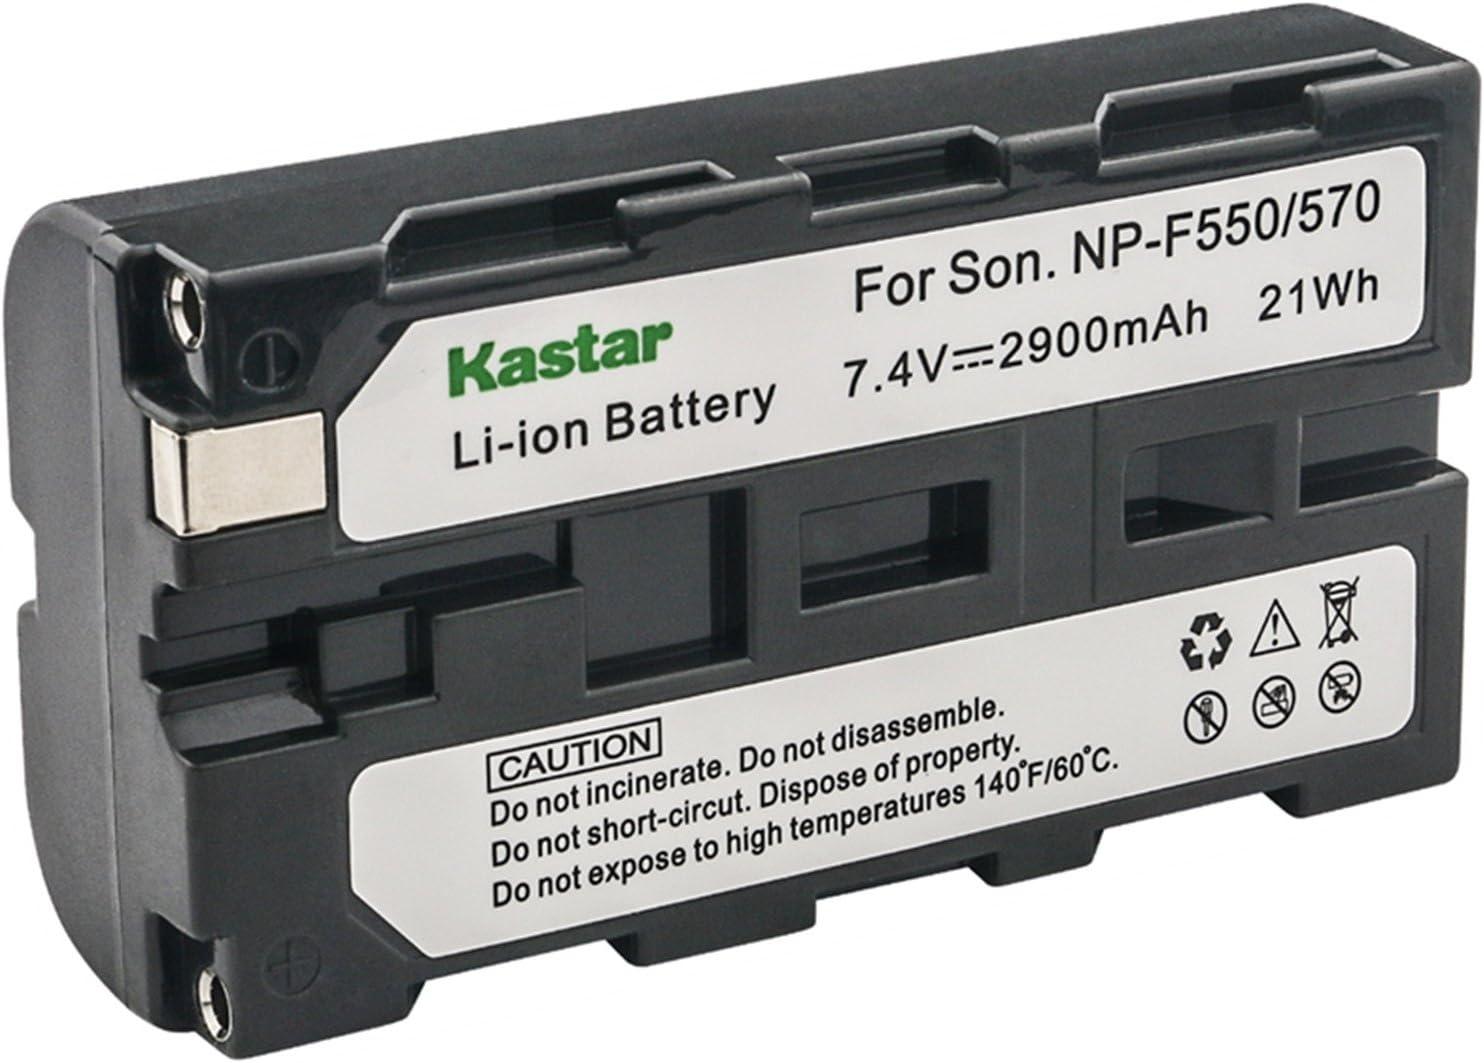 Battery for Sony NP-F550 Handycam CCD-TRV15 DCR-TRV315 CCD-TR940 CCD-TRV85 TRV66